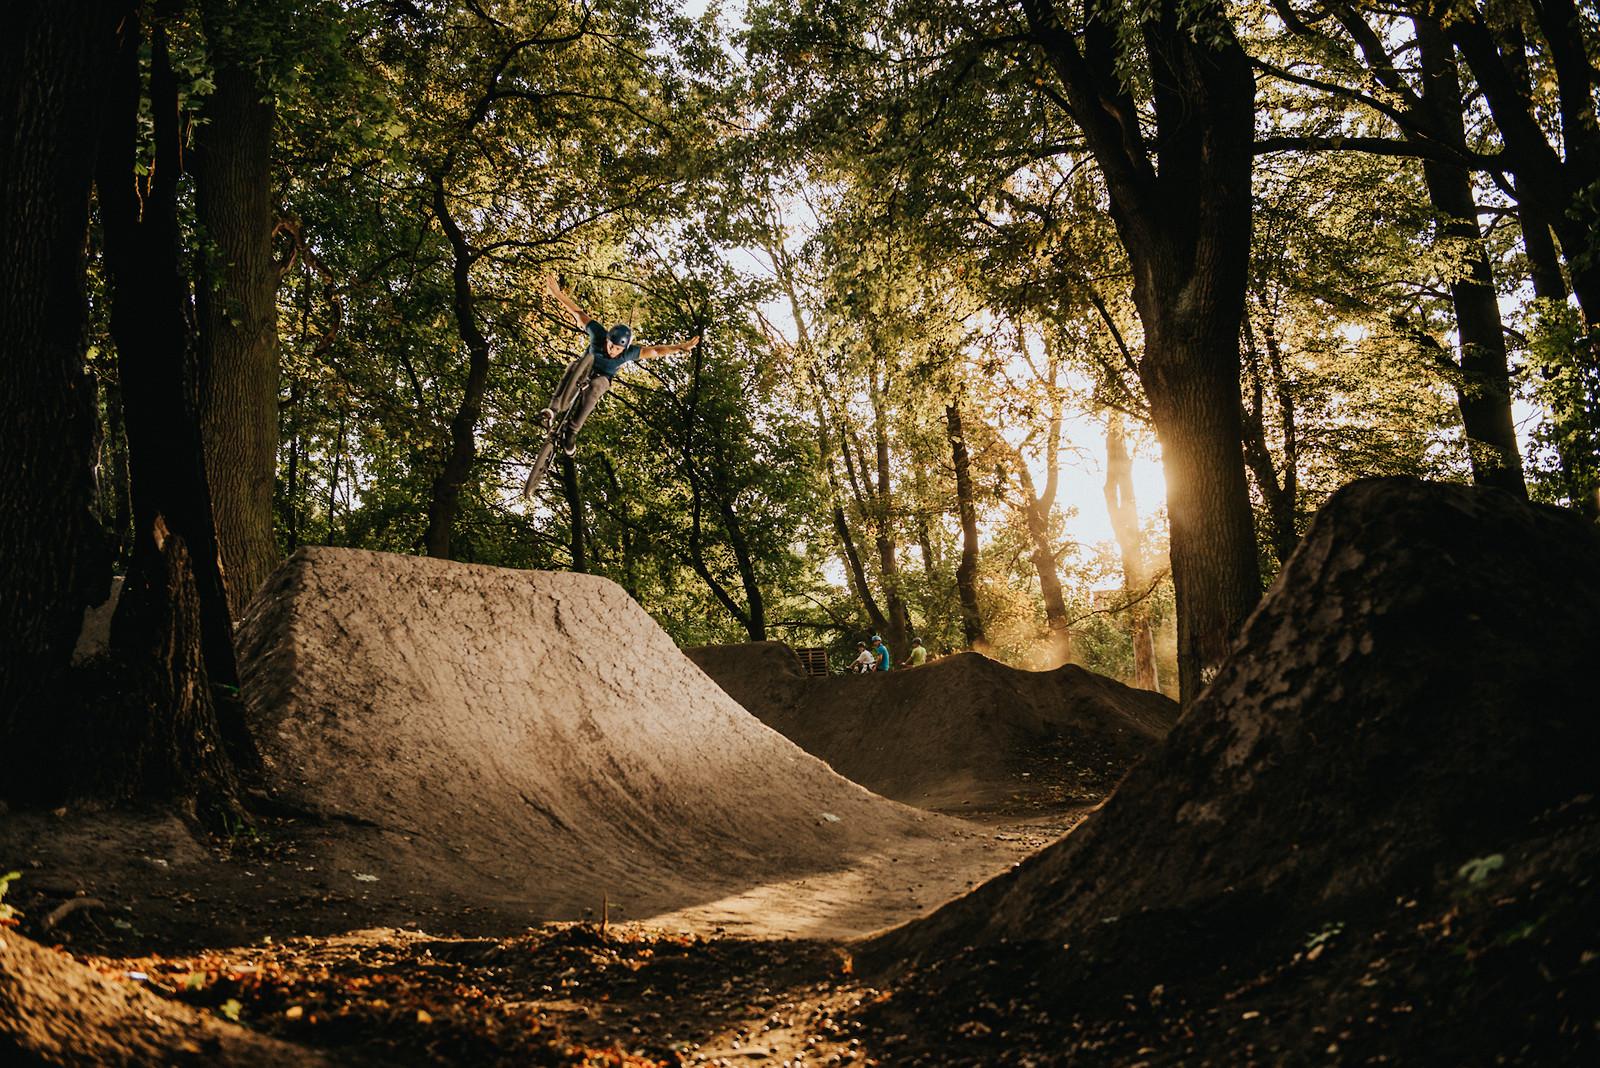 Tuck no hander - Adam_GLosowic - Mountain Biking Pictures - Vital MTB